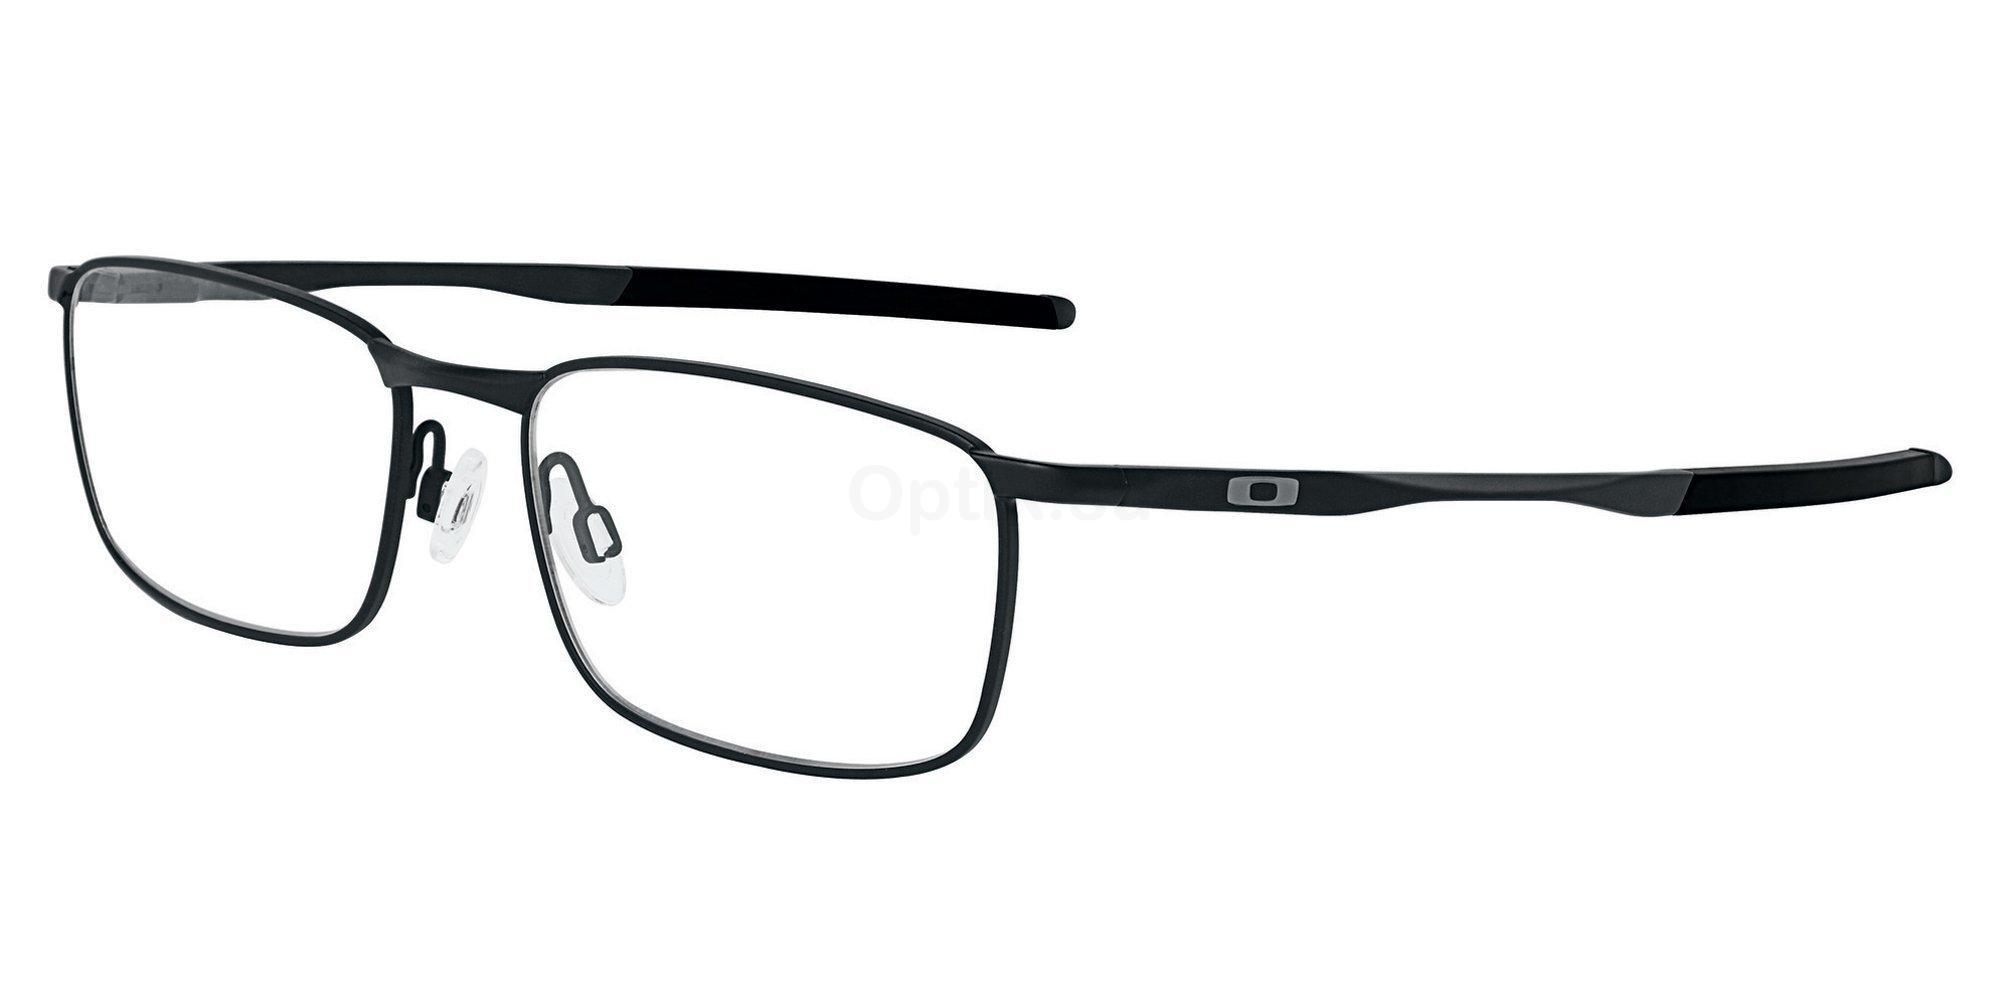 317301 OX3173 BARRELHOUSE Glasses, Oakley